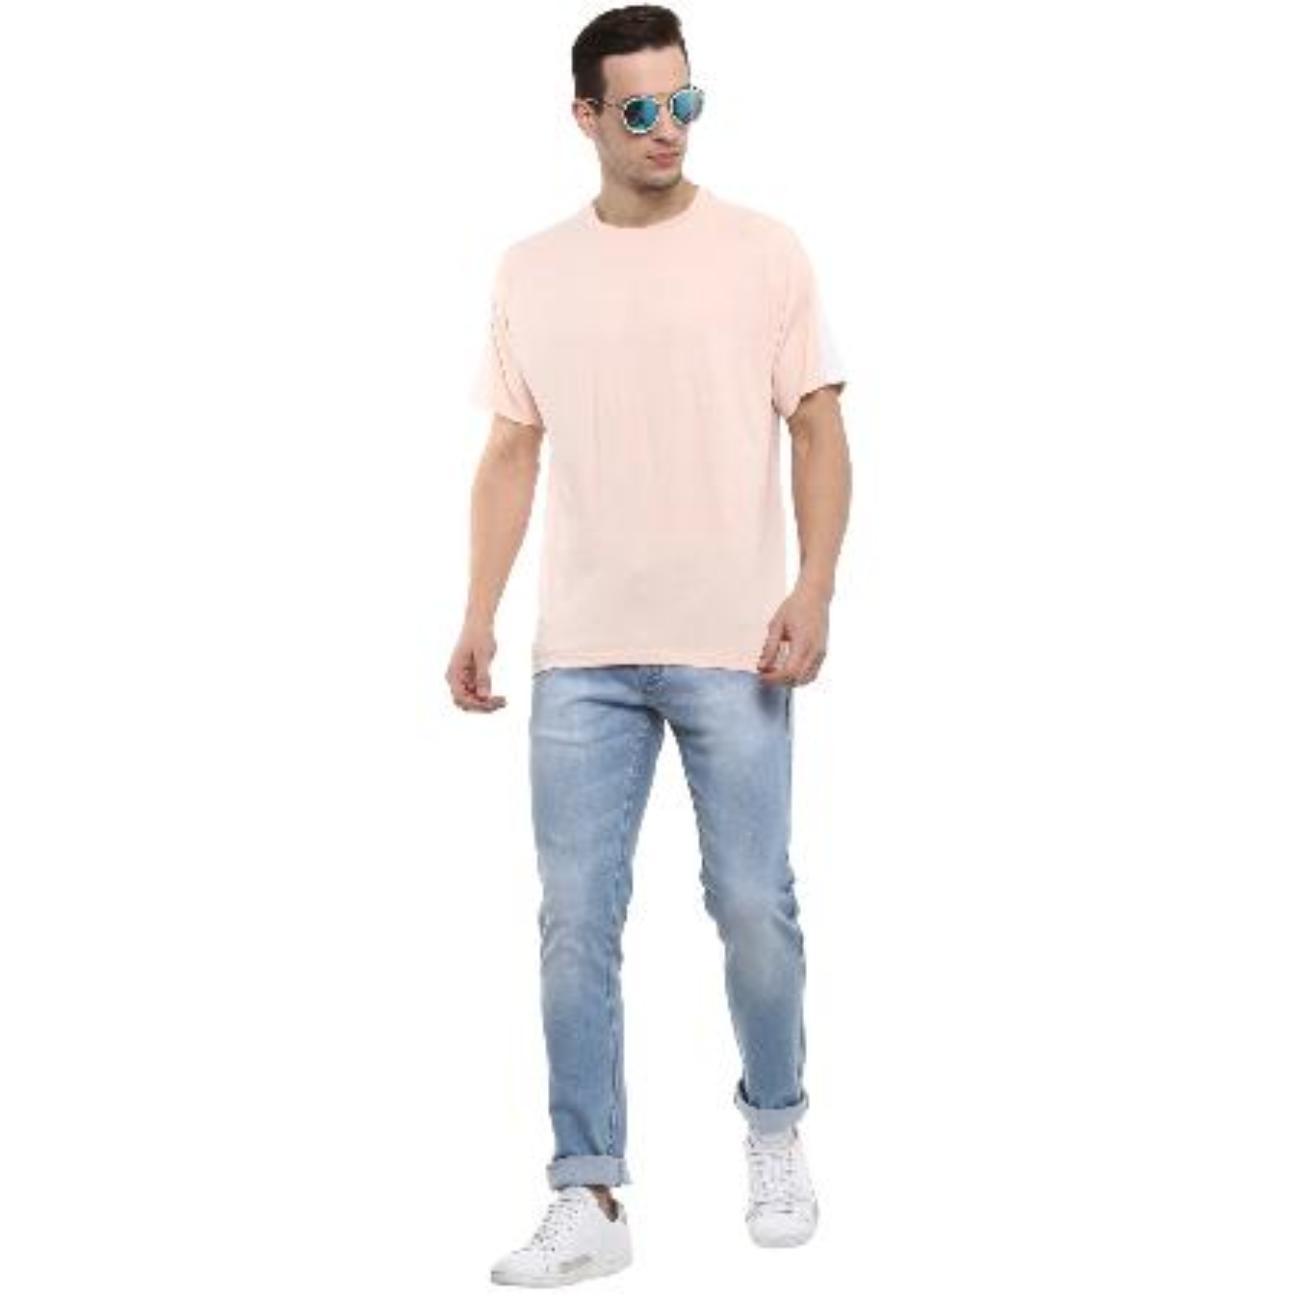 Online TShirts for Men